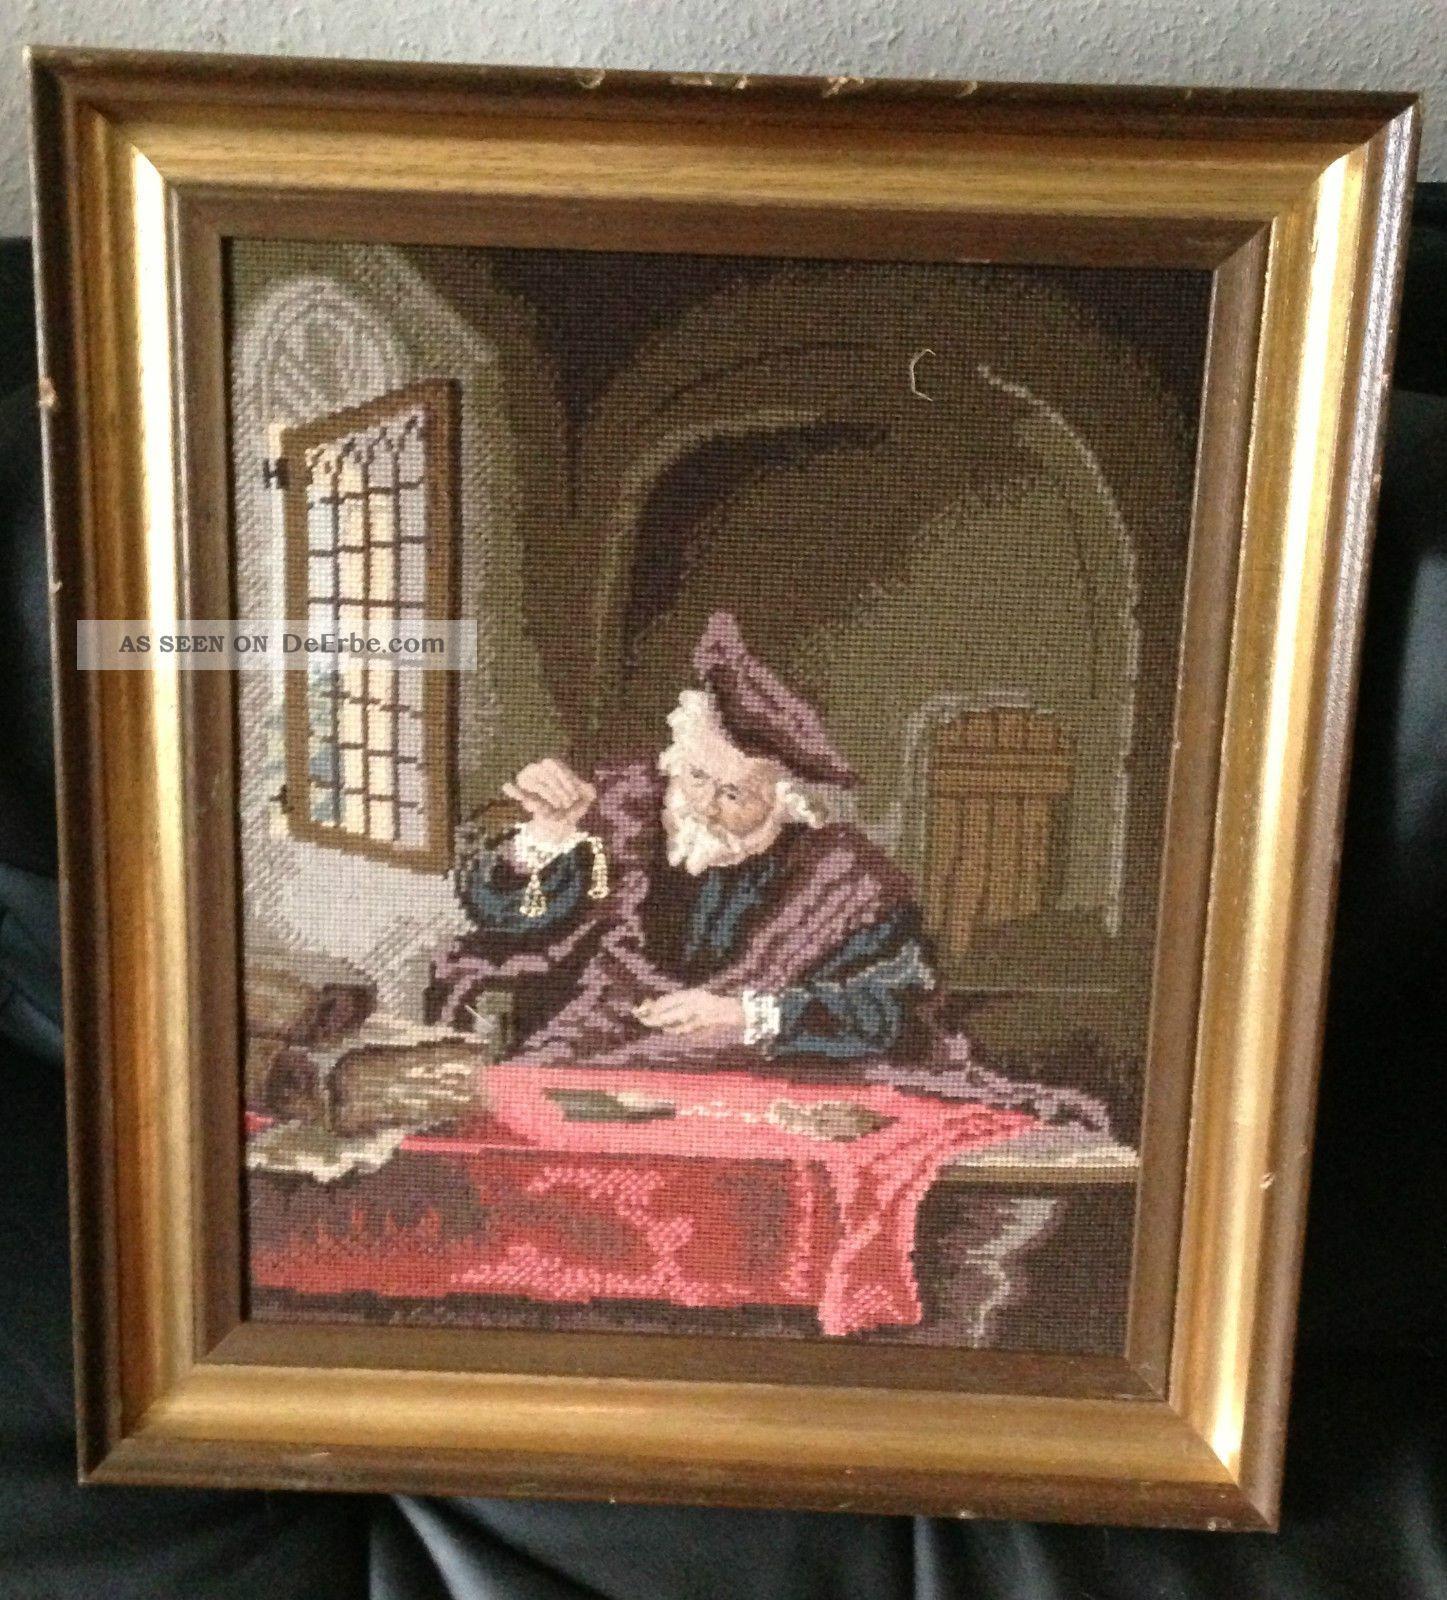 antik edel holz bilderrahmen gold verzierungen gobelin bild gem lde 61x53cm. Black Bedroom Furniture Sets. Home Design Ideas